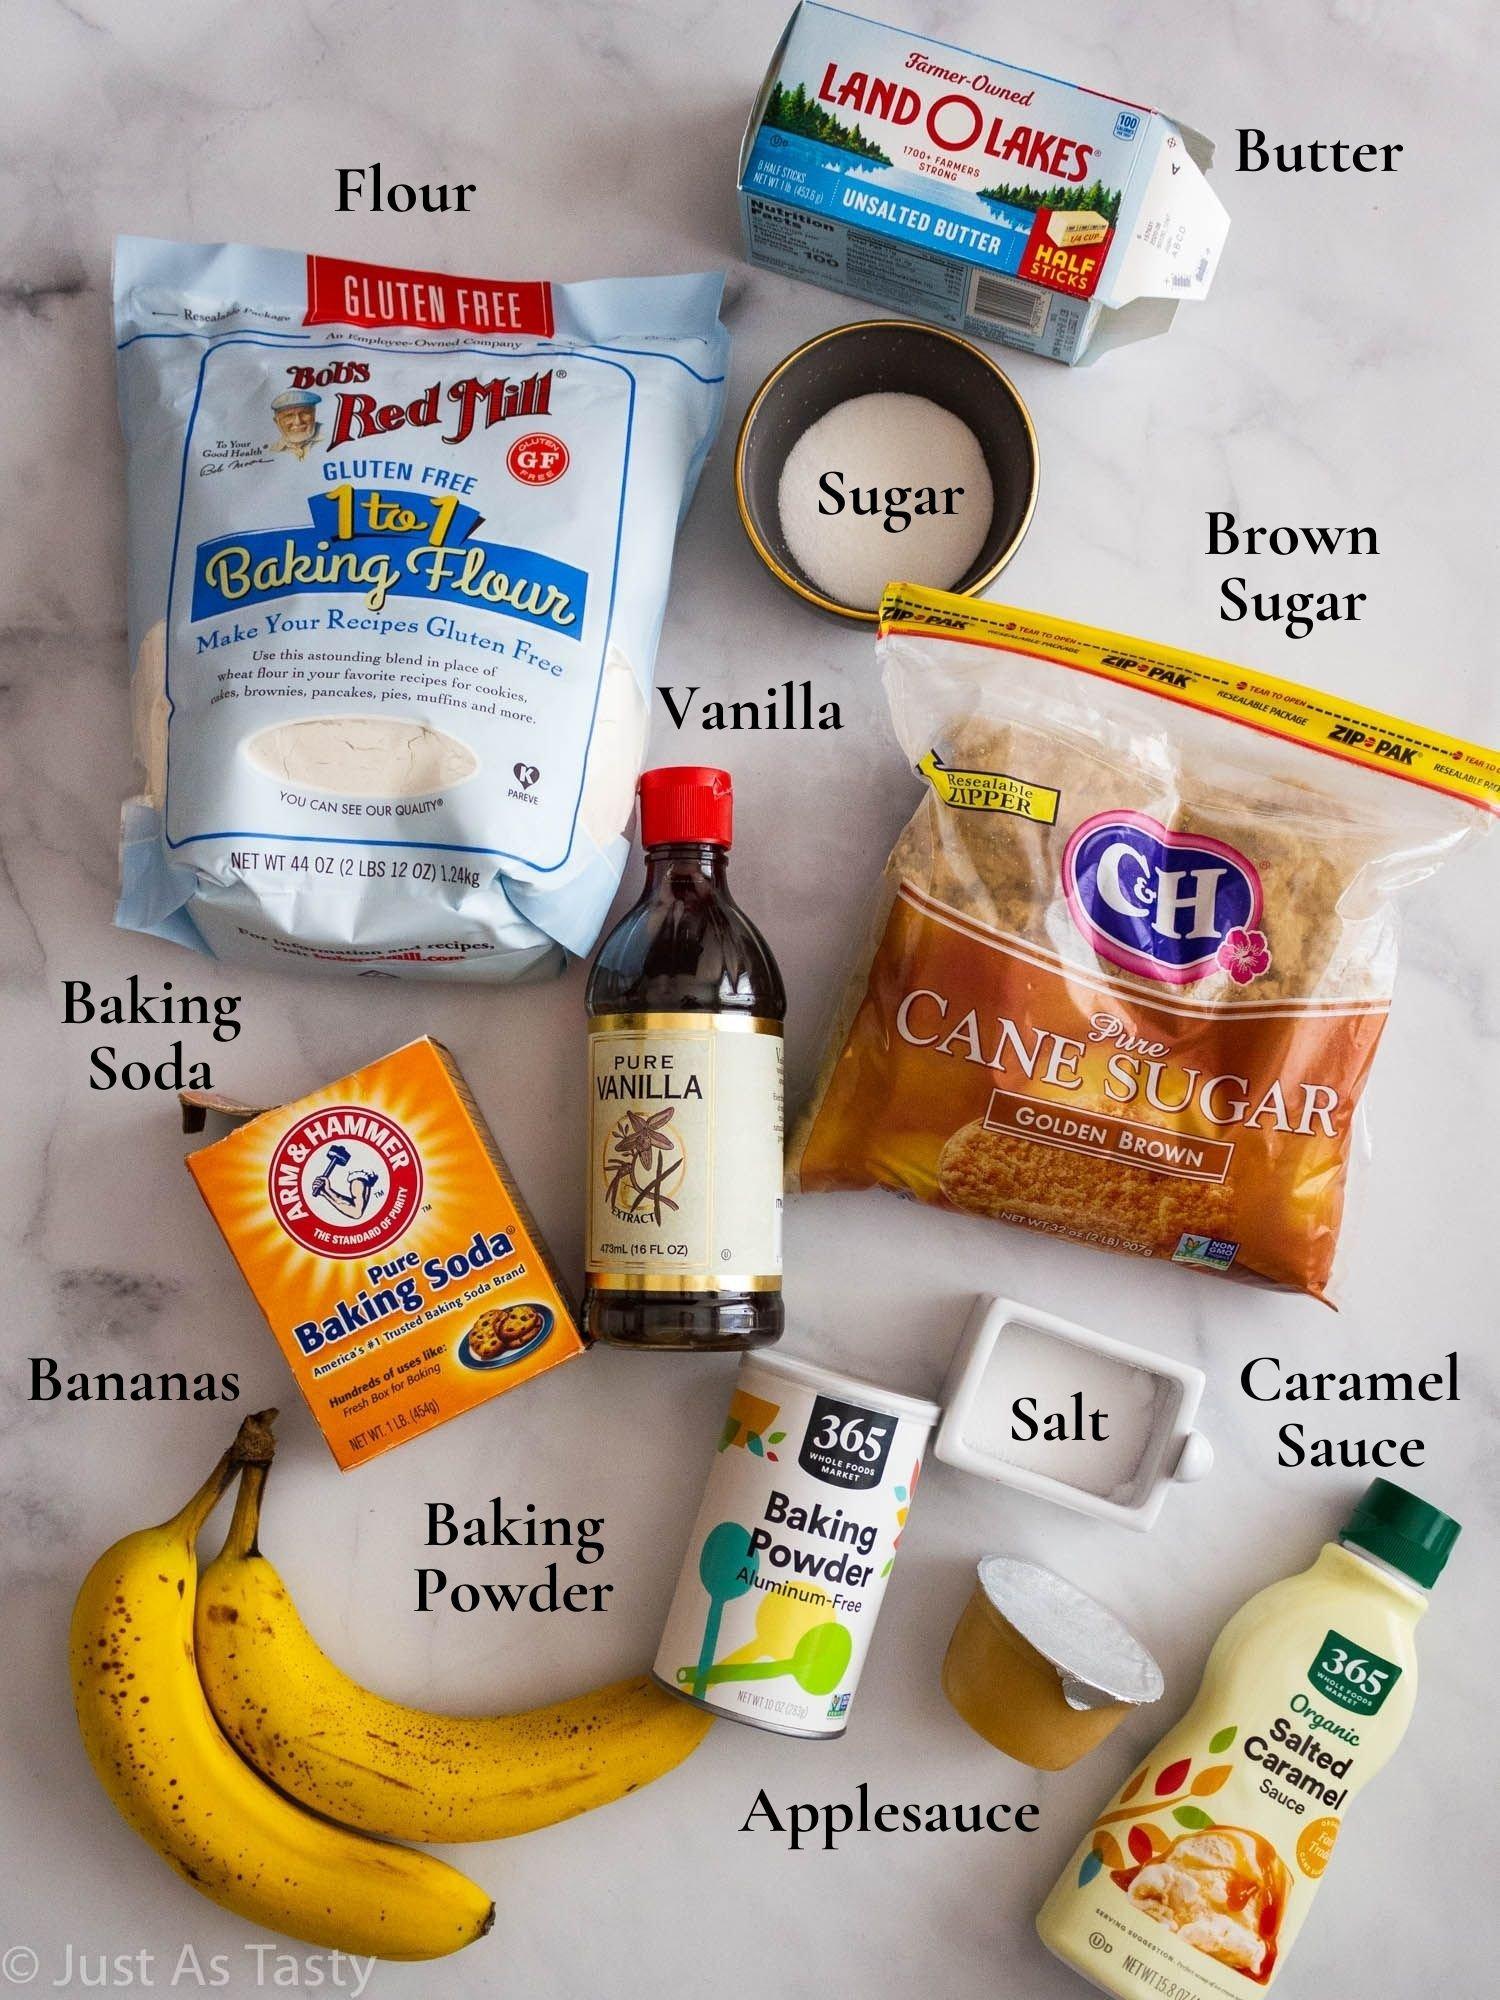 Salted caramel banana bread ingredients.